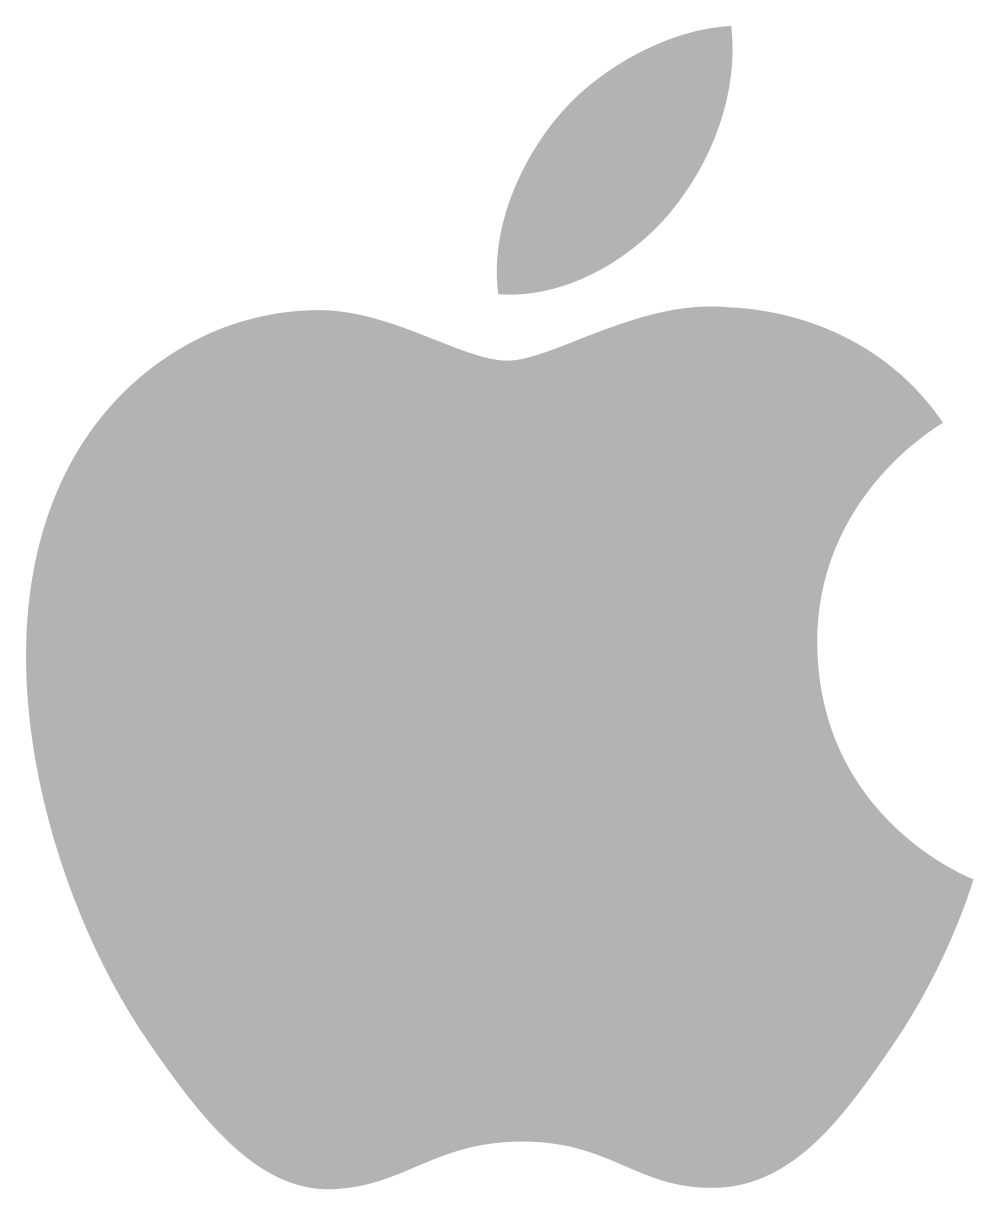 Apple Inc. clipart apple logo #3